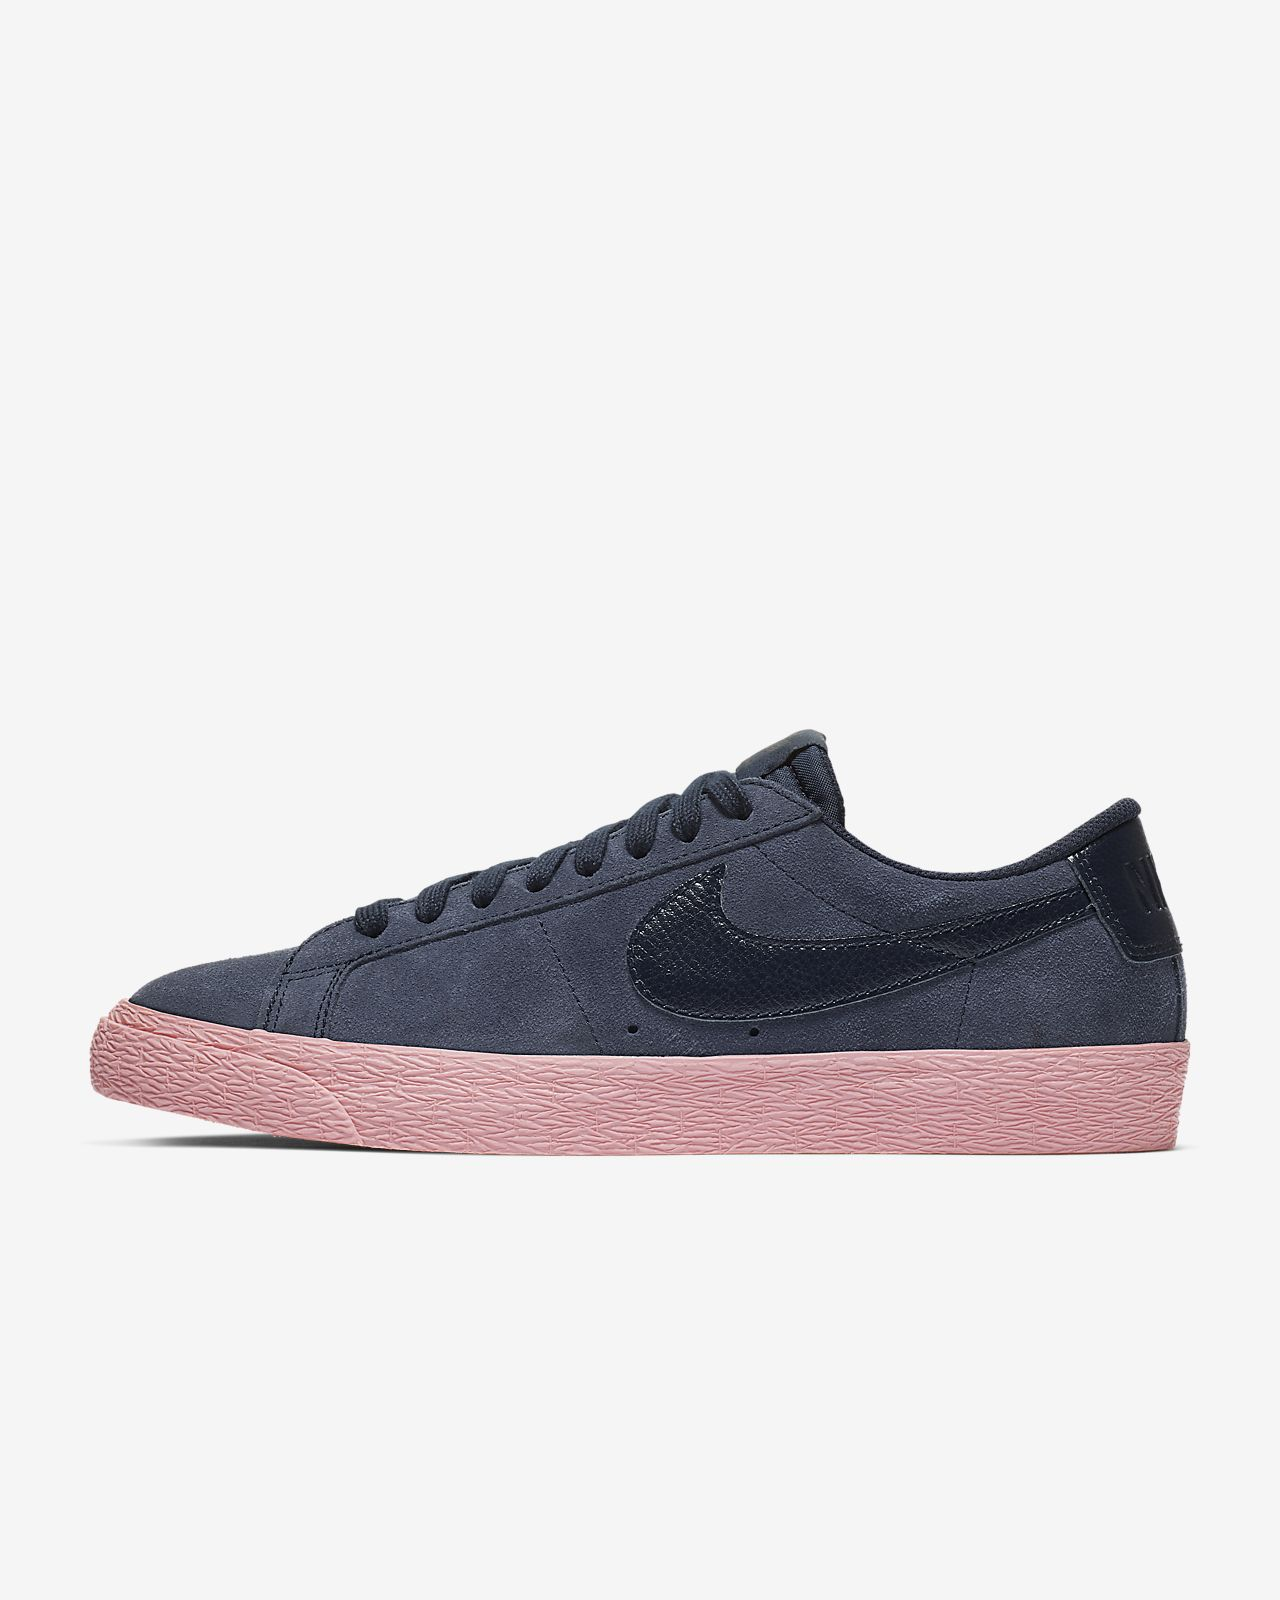 cheap for discount 7bf22 f5cb4 ... Nike SB Blazer Zoom Low Zapatillas de skateboard - Hombre